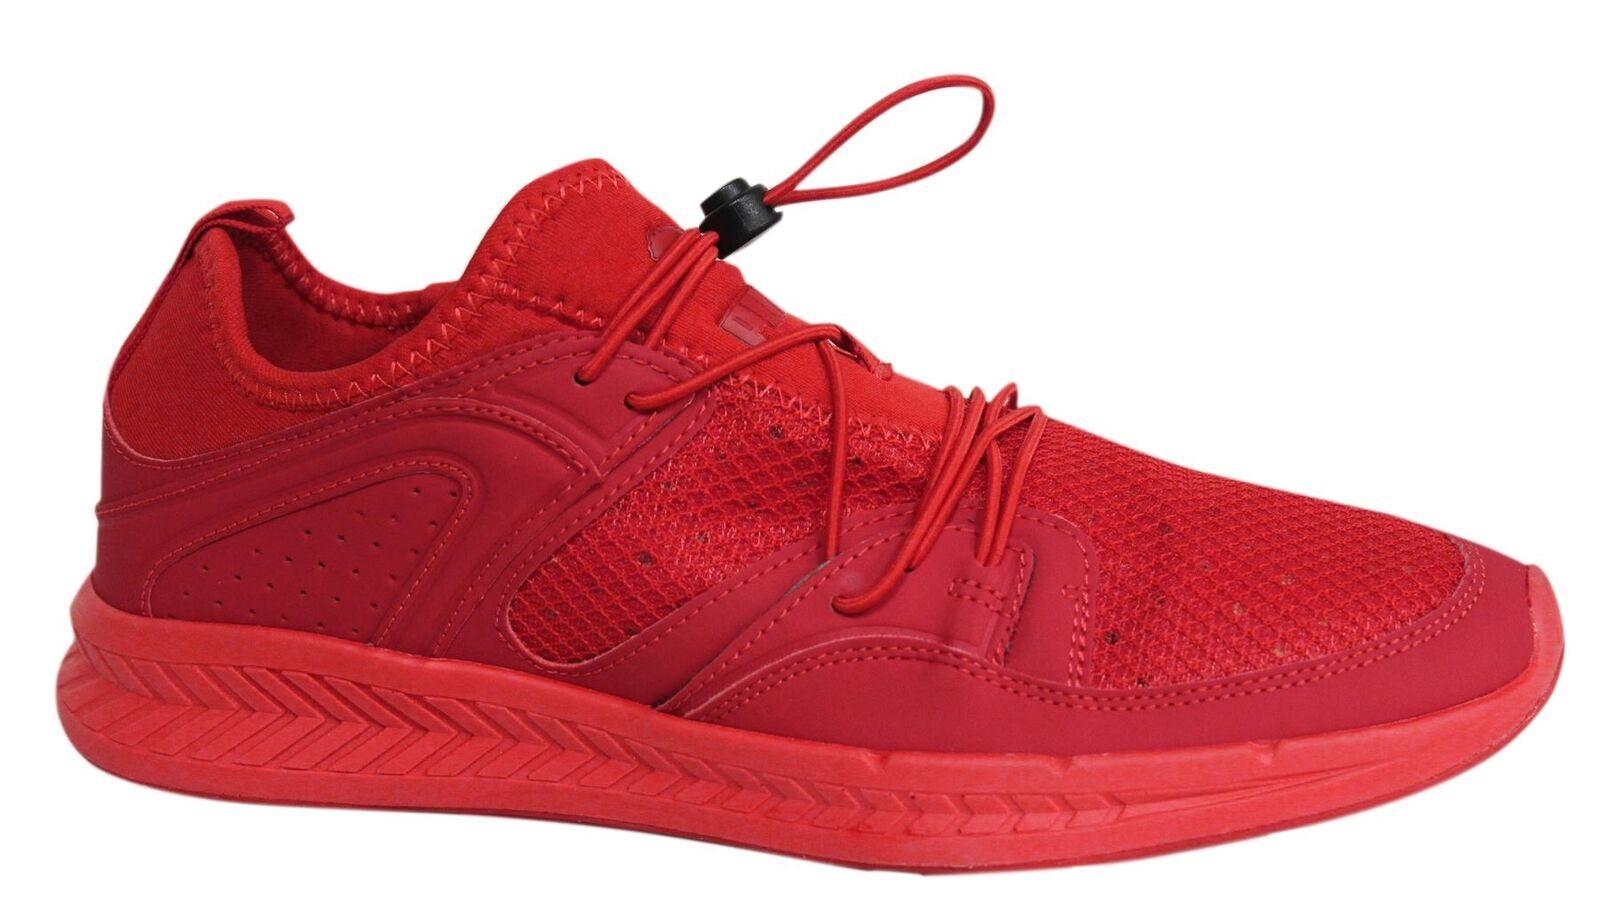 Puma Blaze Lace Ignite Future Minimal Lace Blaze Up  Herren ROT Trainers 362289 02 M11 1e5184